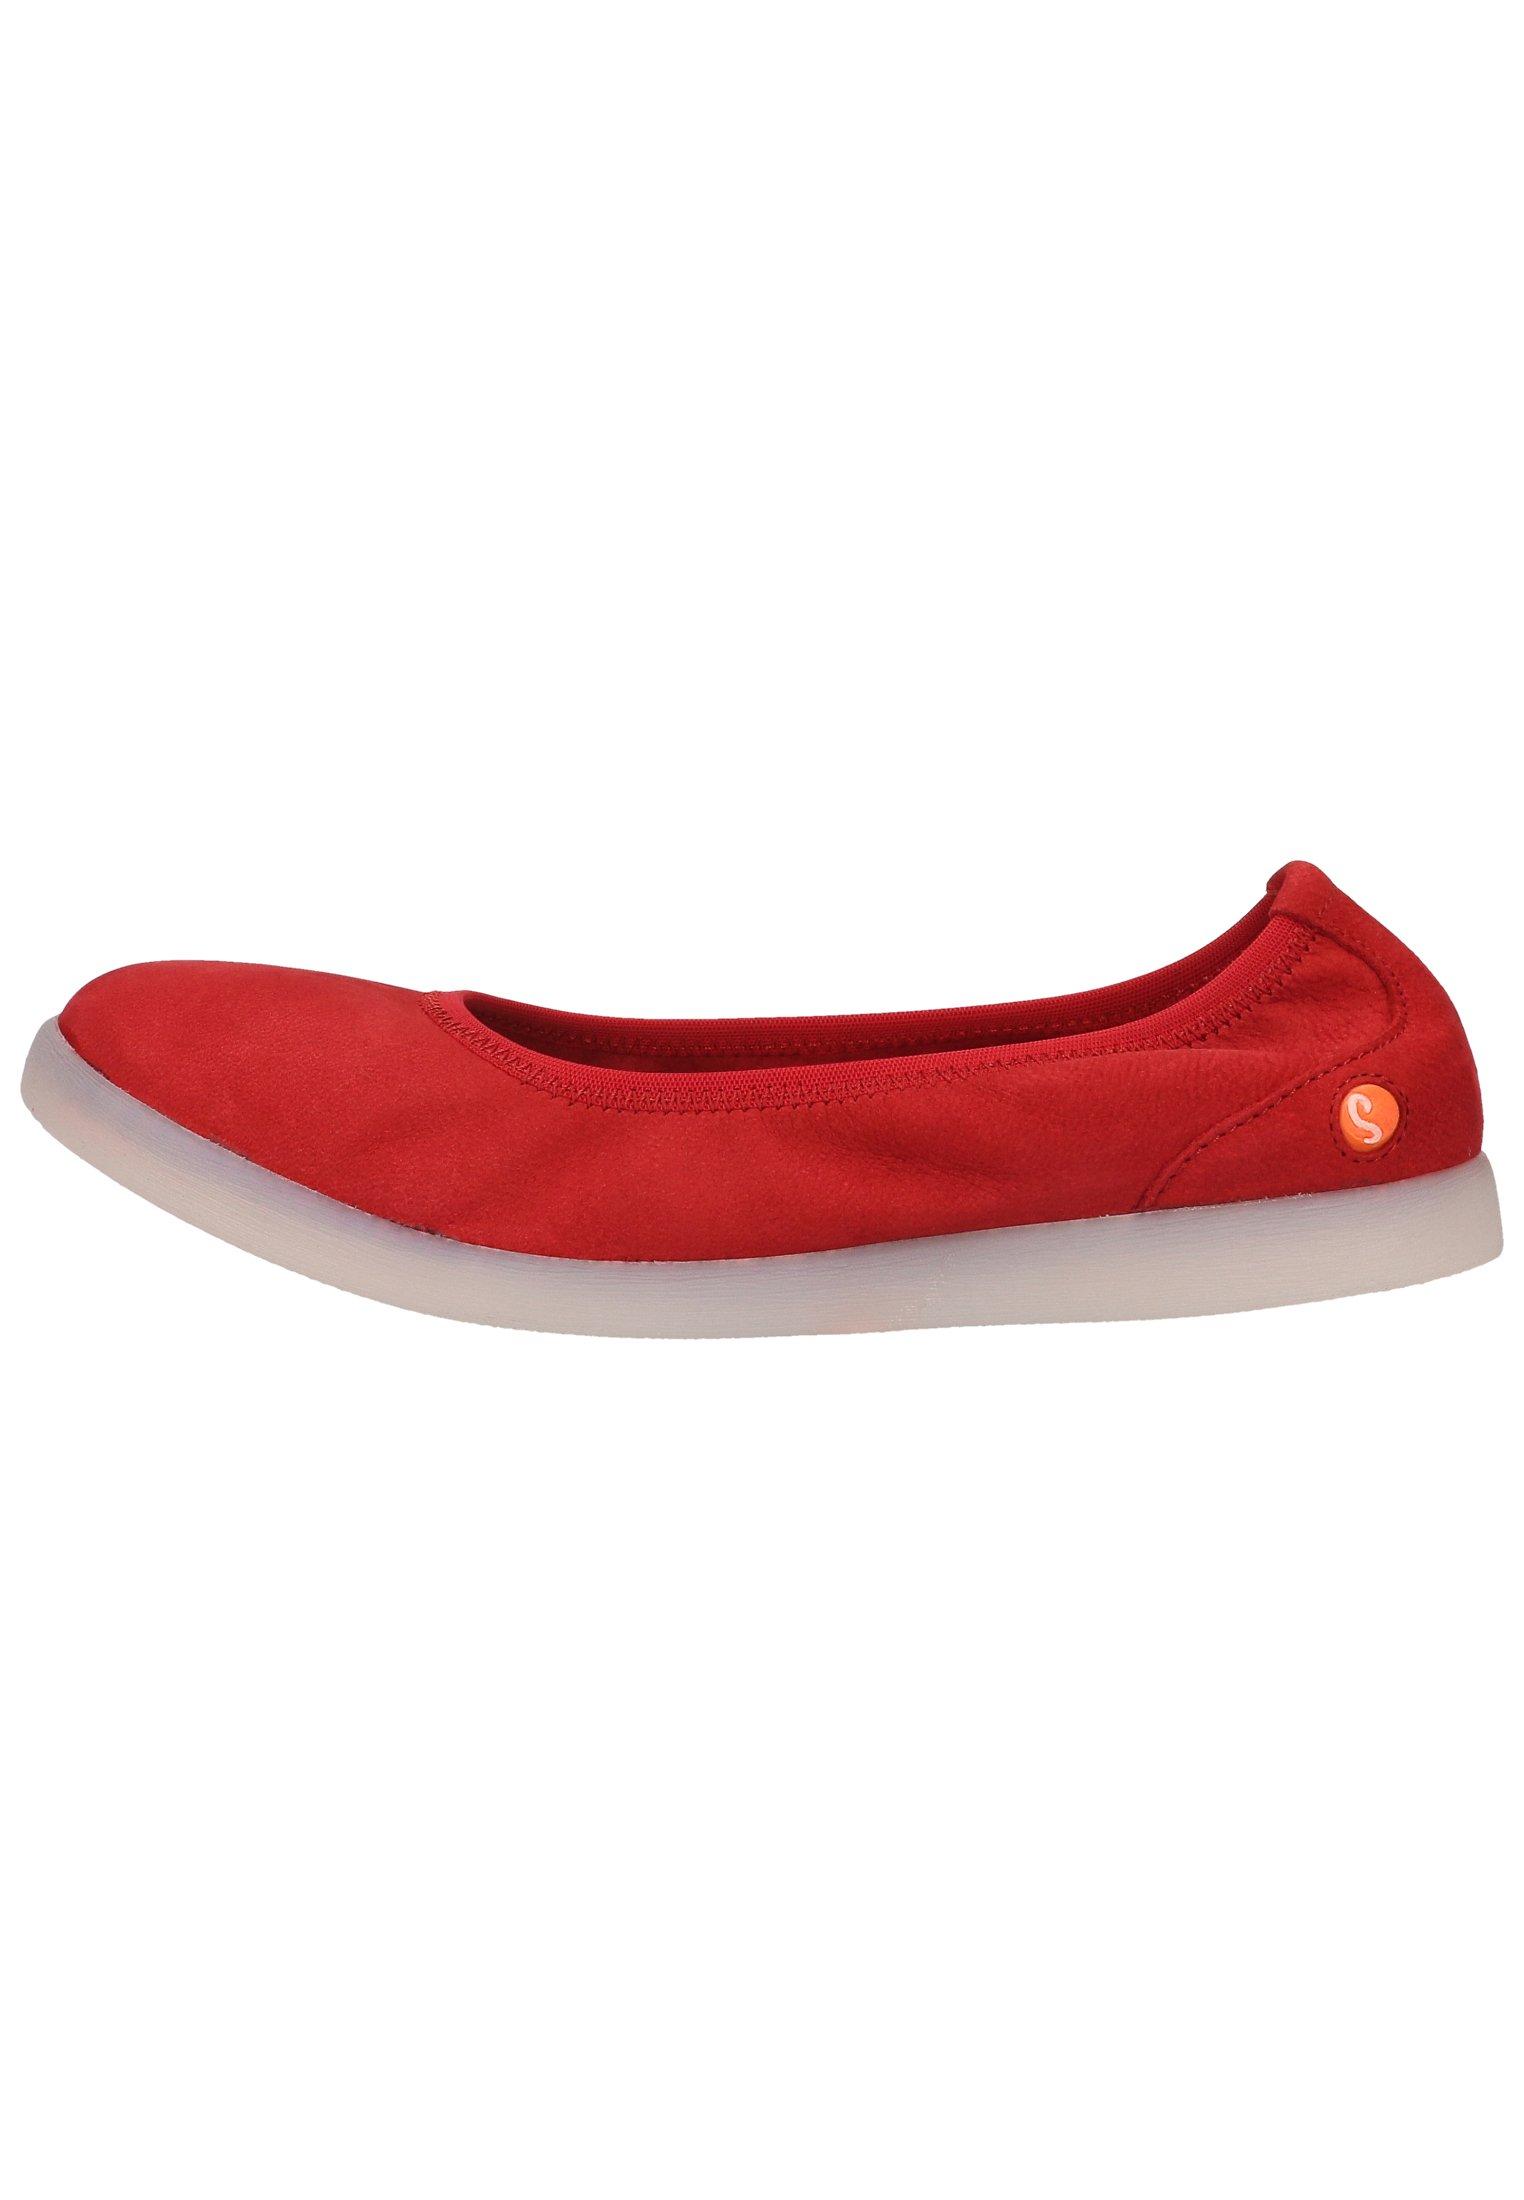 Femme Ballerines pliables - cherry red